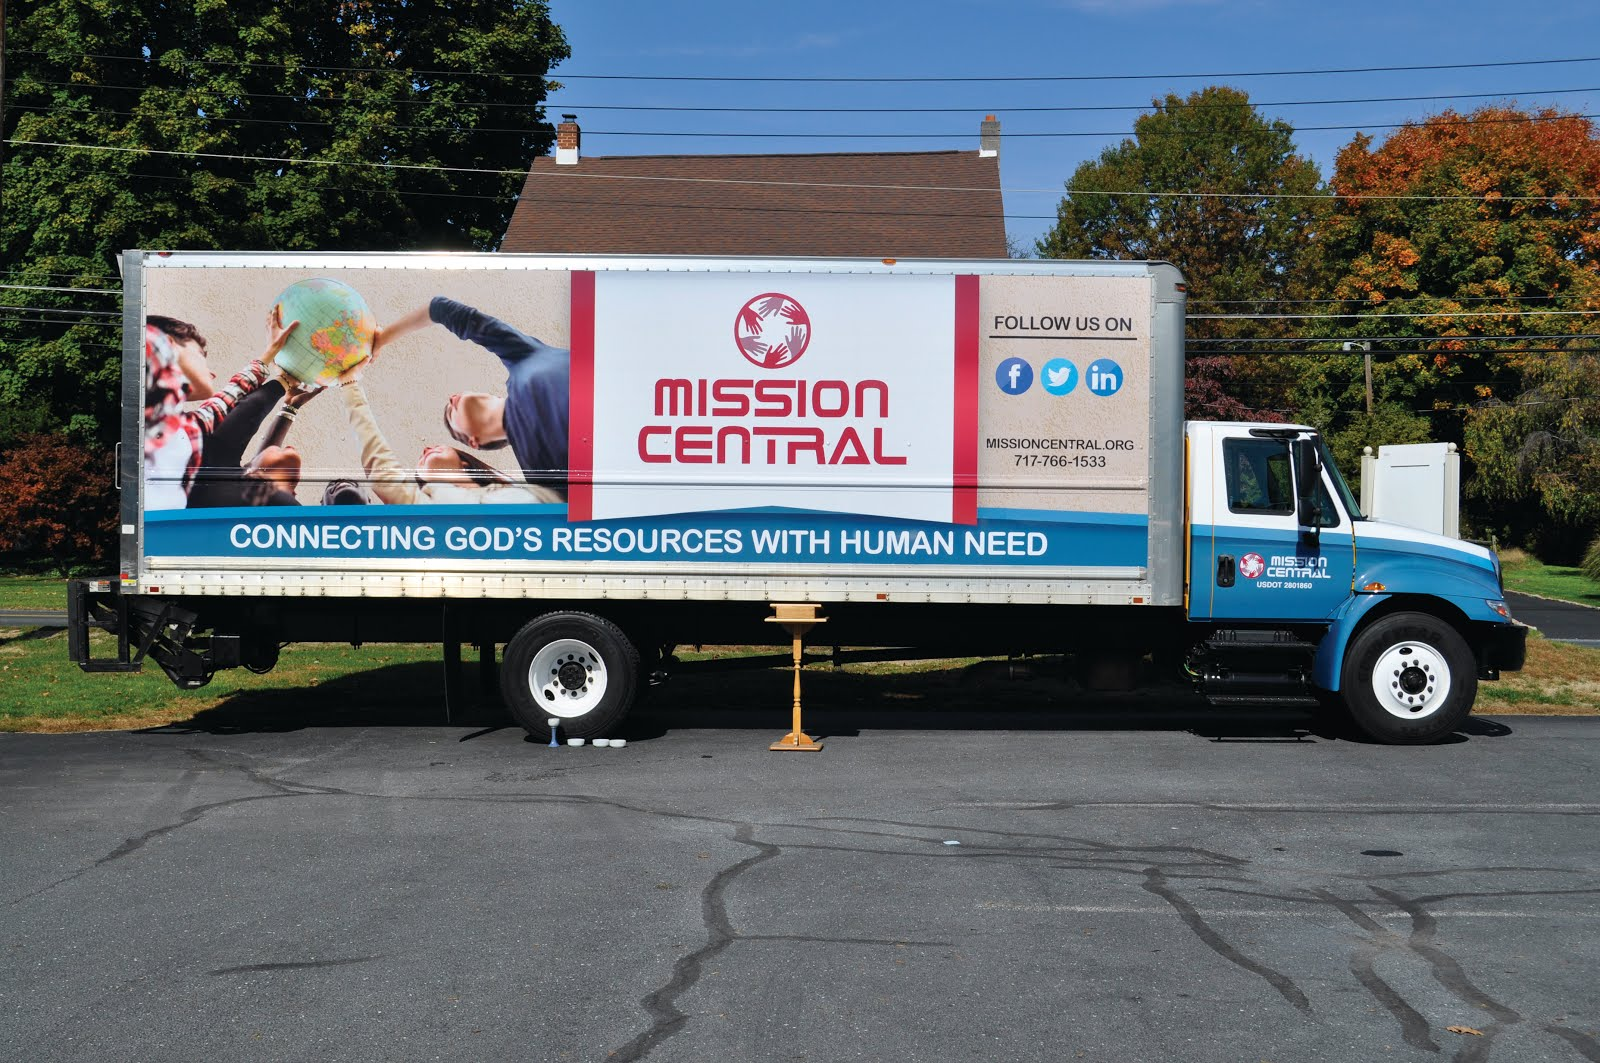 susquehanna link mission central dedicates new truck. Black Bedroom Furniture Sets. Home Design Ideas